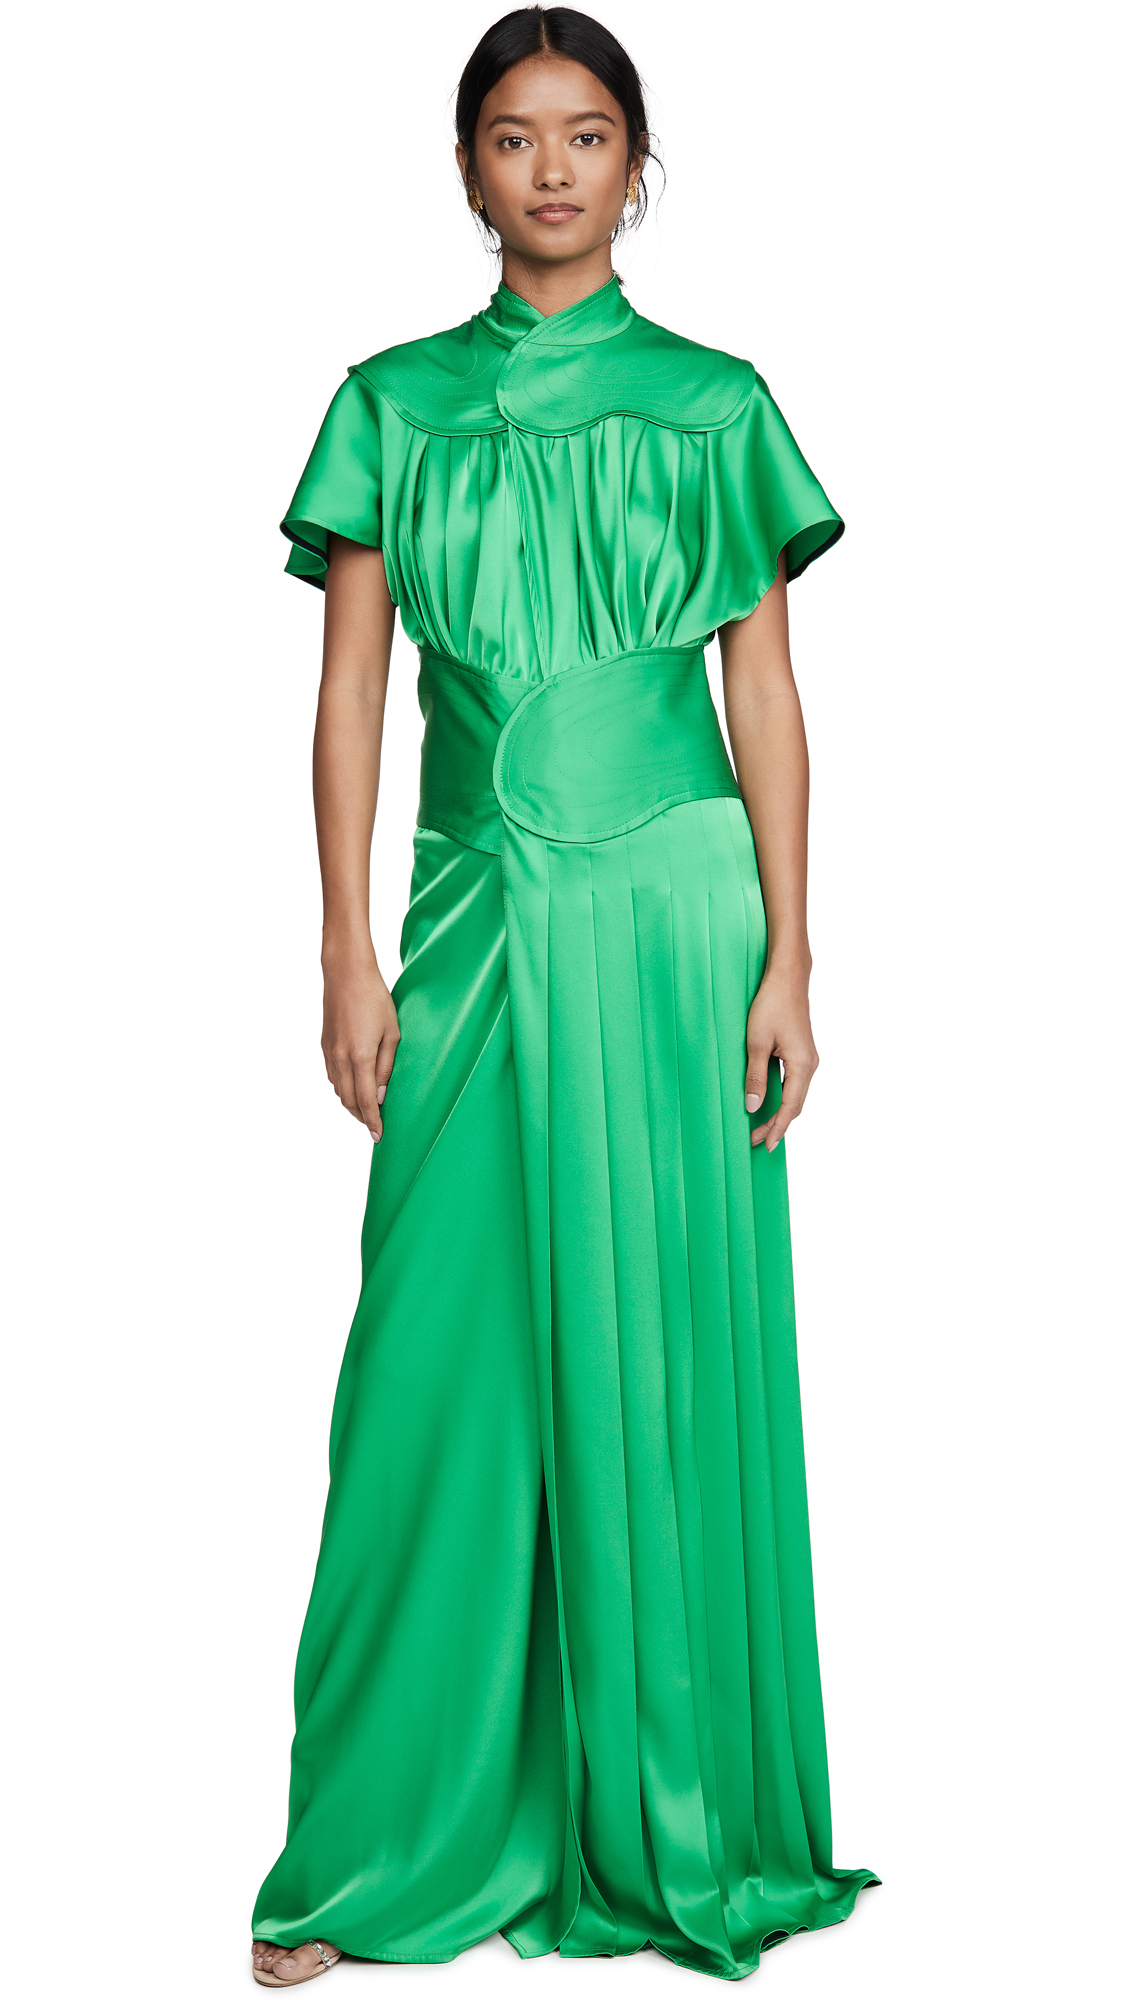 Victoria Beckham Contrast Panel Floor Length Dress - 50% Off Sale